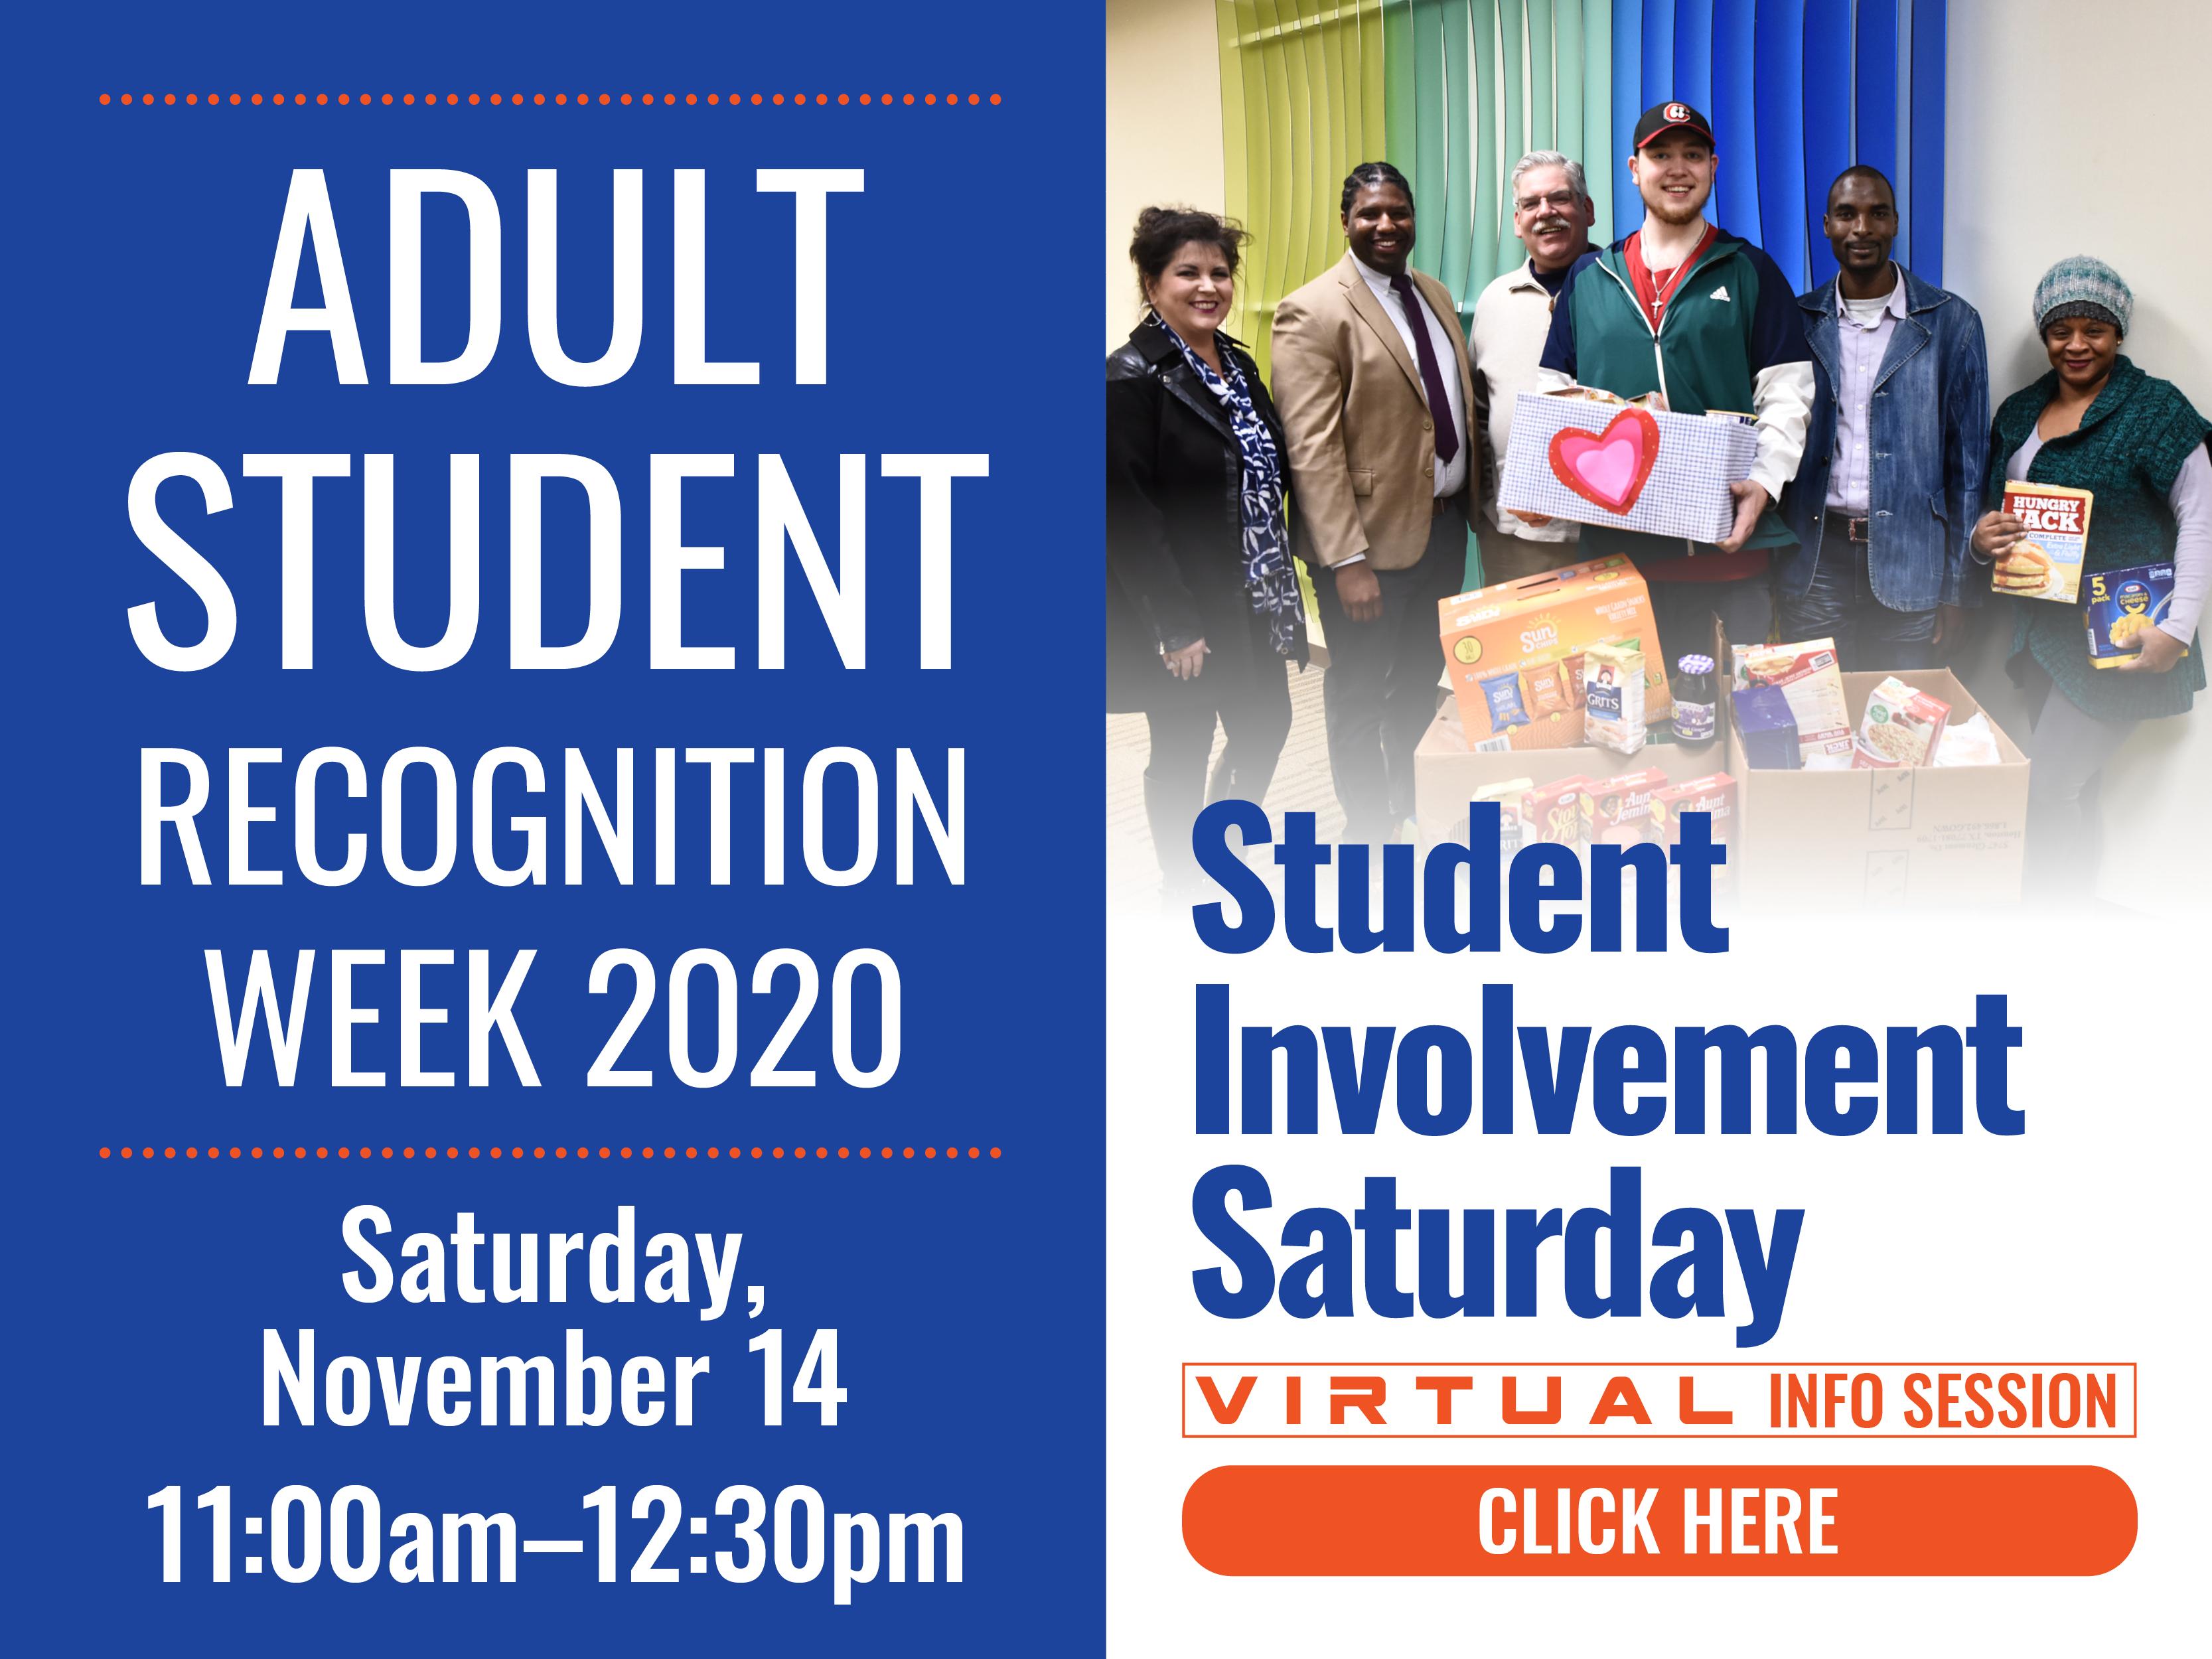 Student Involvement Saturday